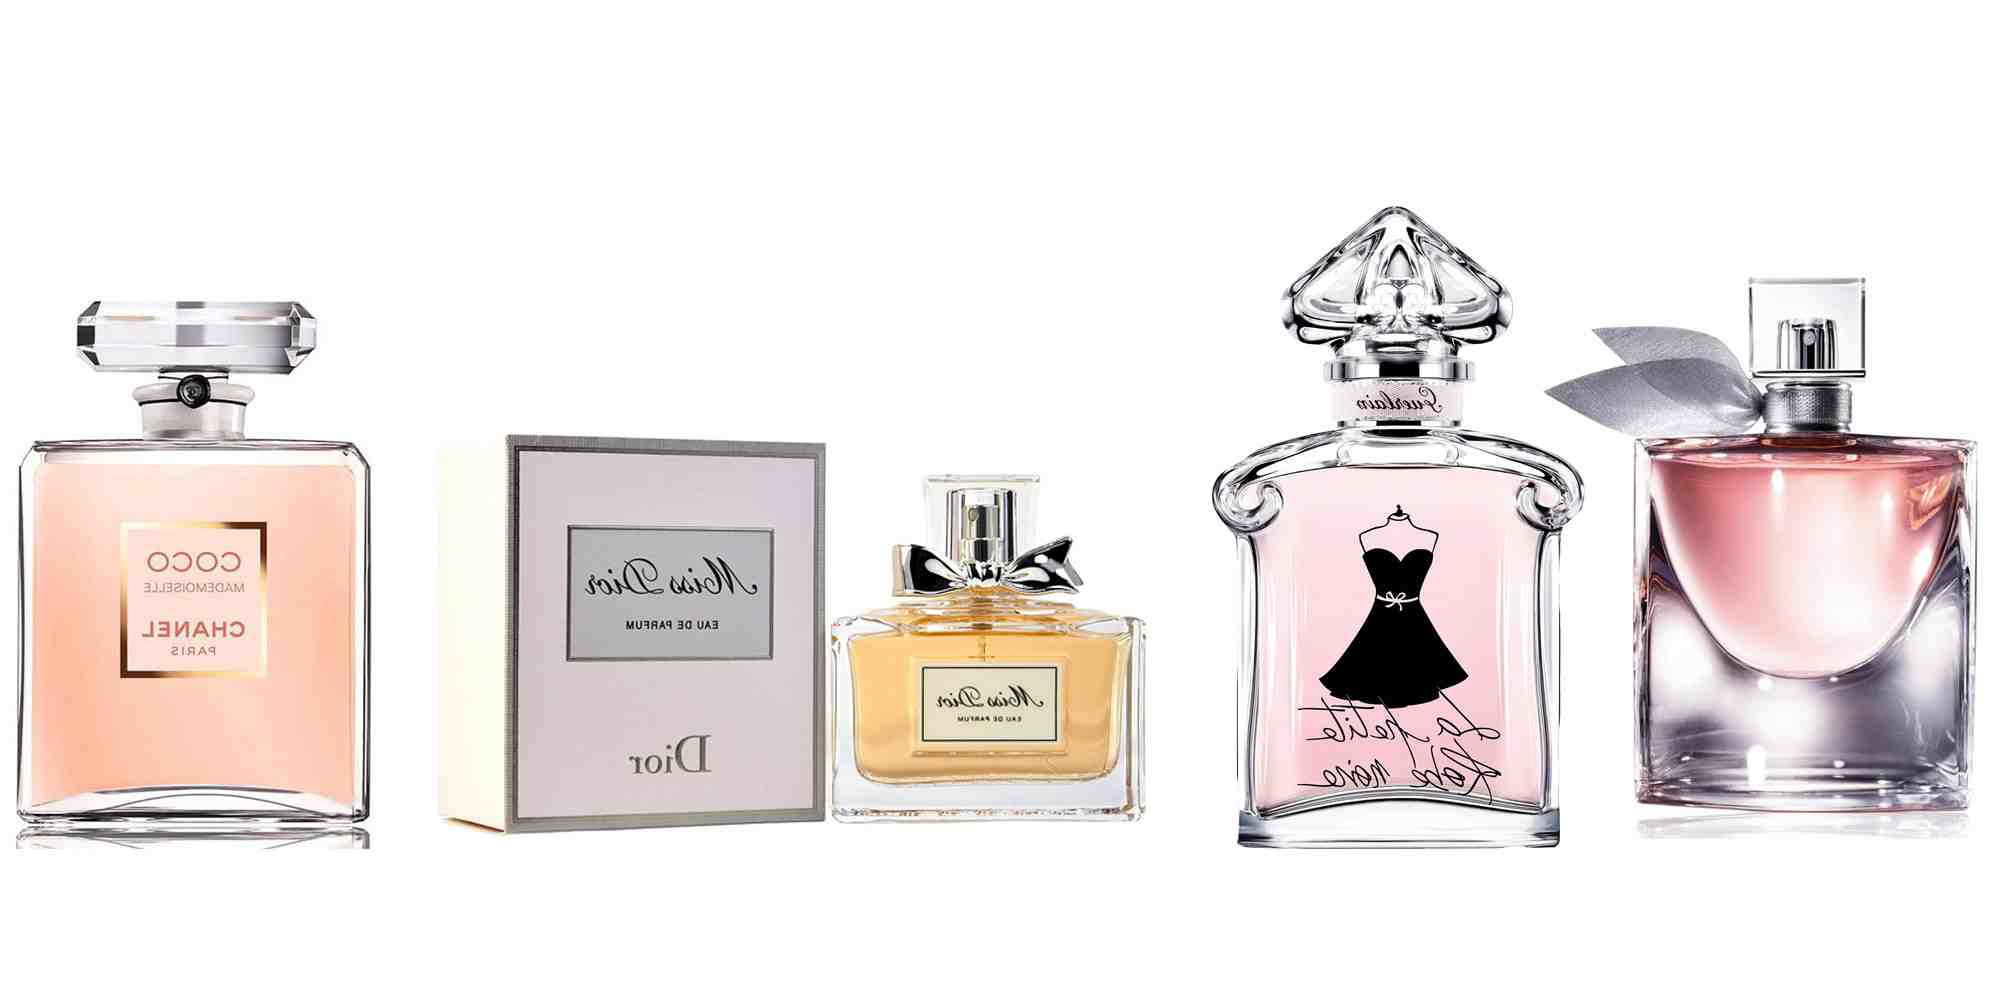 Quels sont les parfums de marque ?